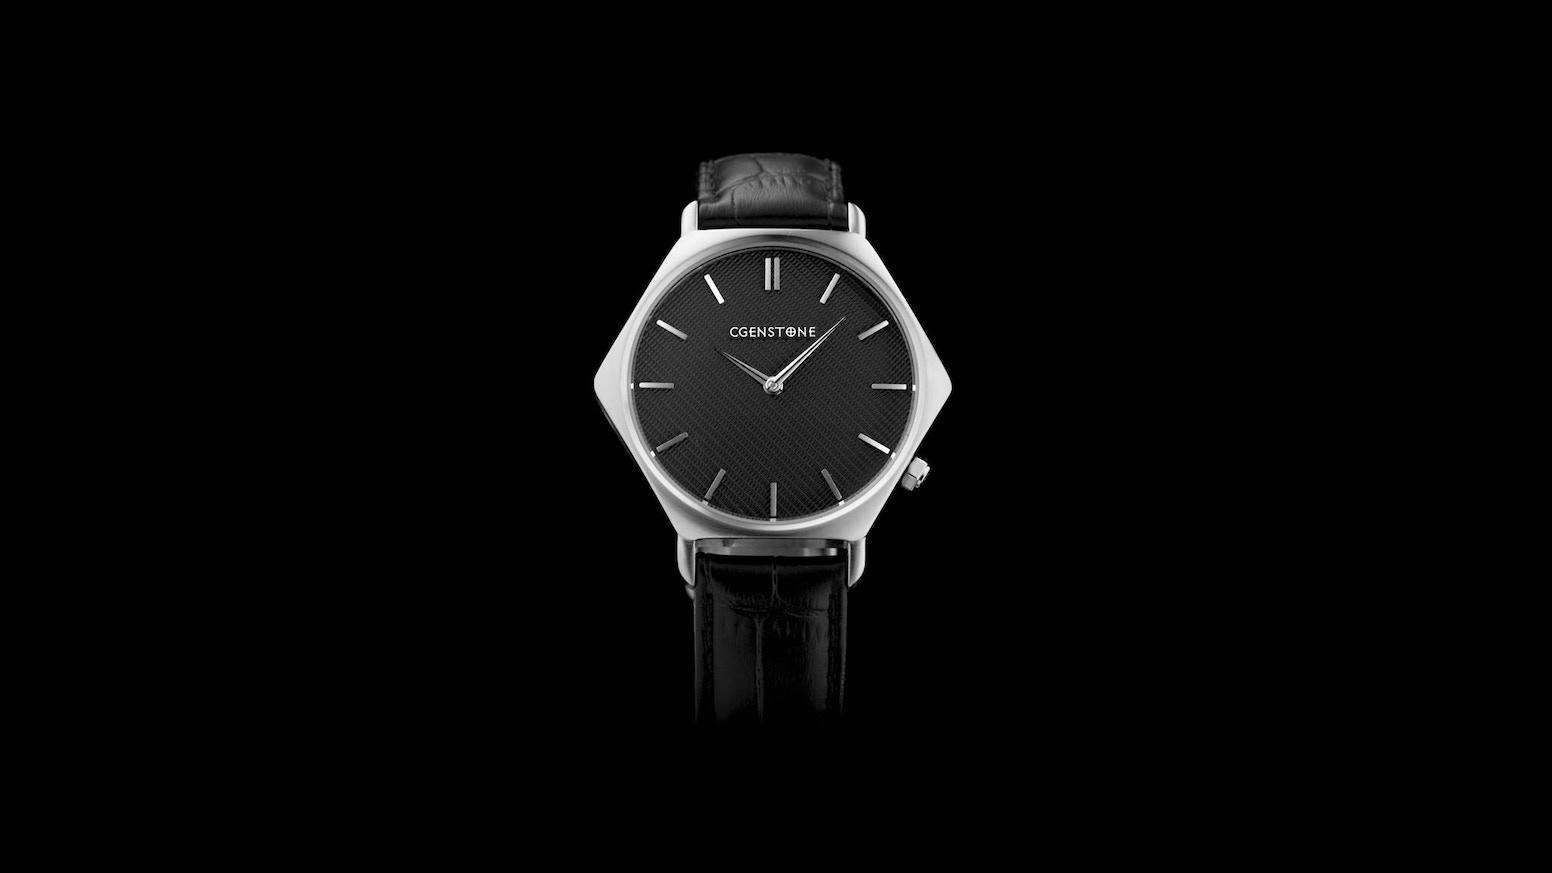 Modern geometric design and traditional handmade craftsmanship. Unique watch By Cgenstone.com